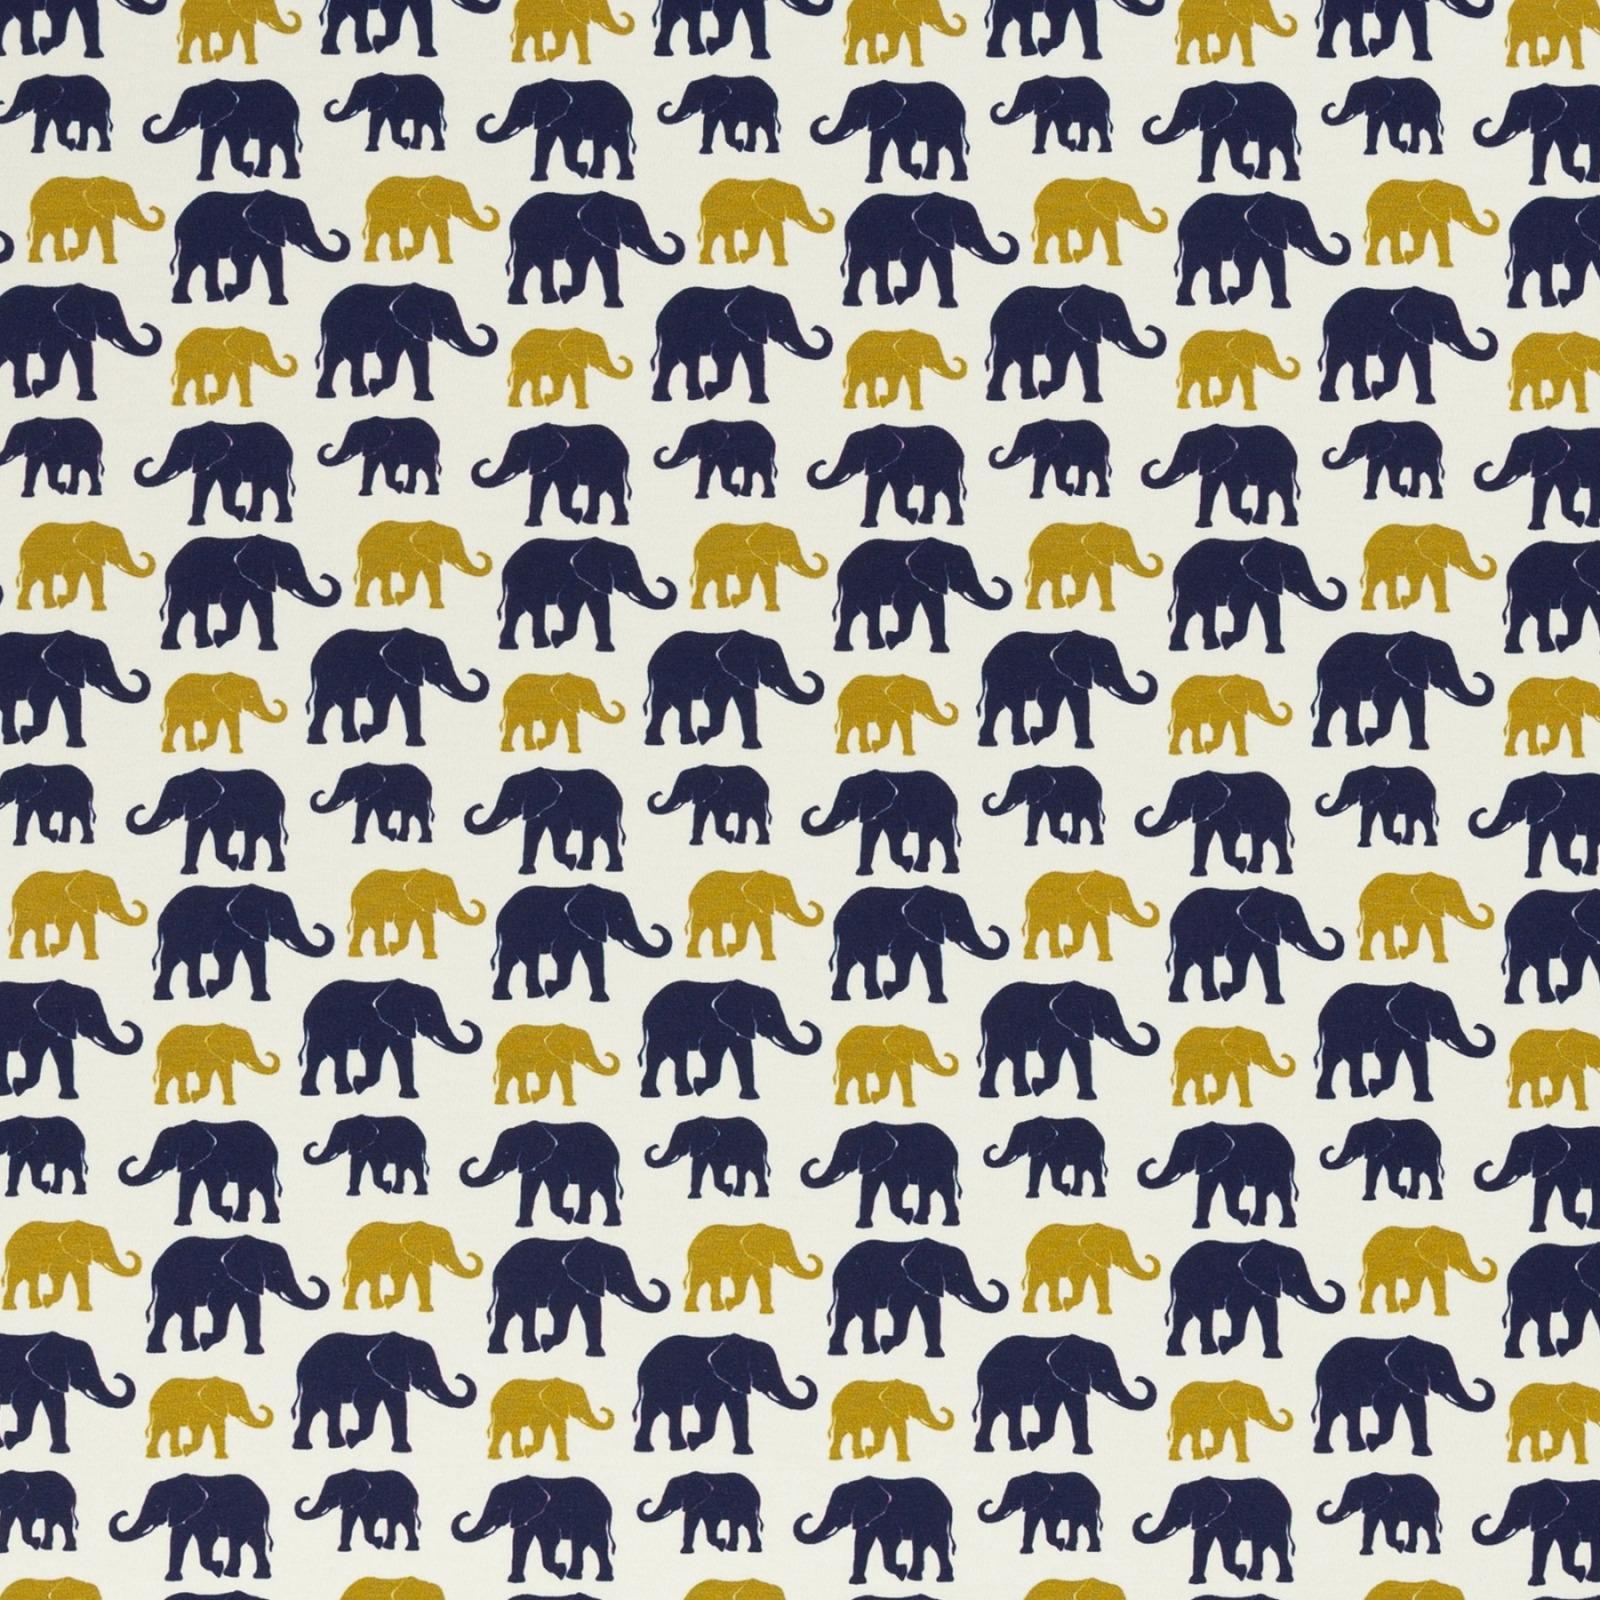 05m Jersey THEO Elefanten ecru ocker